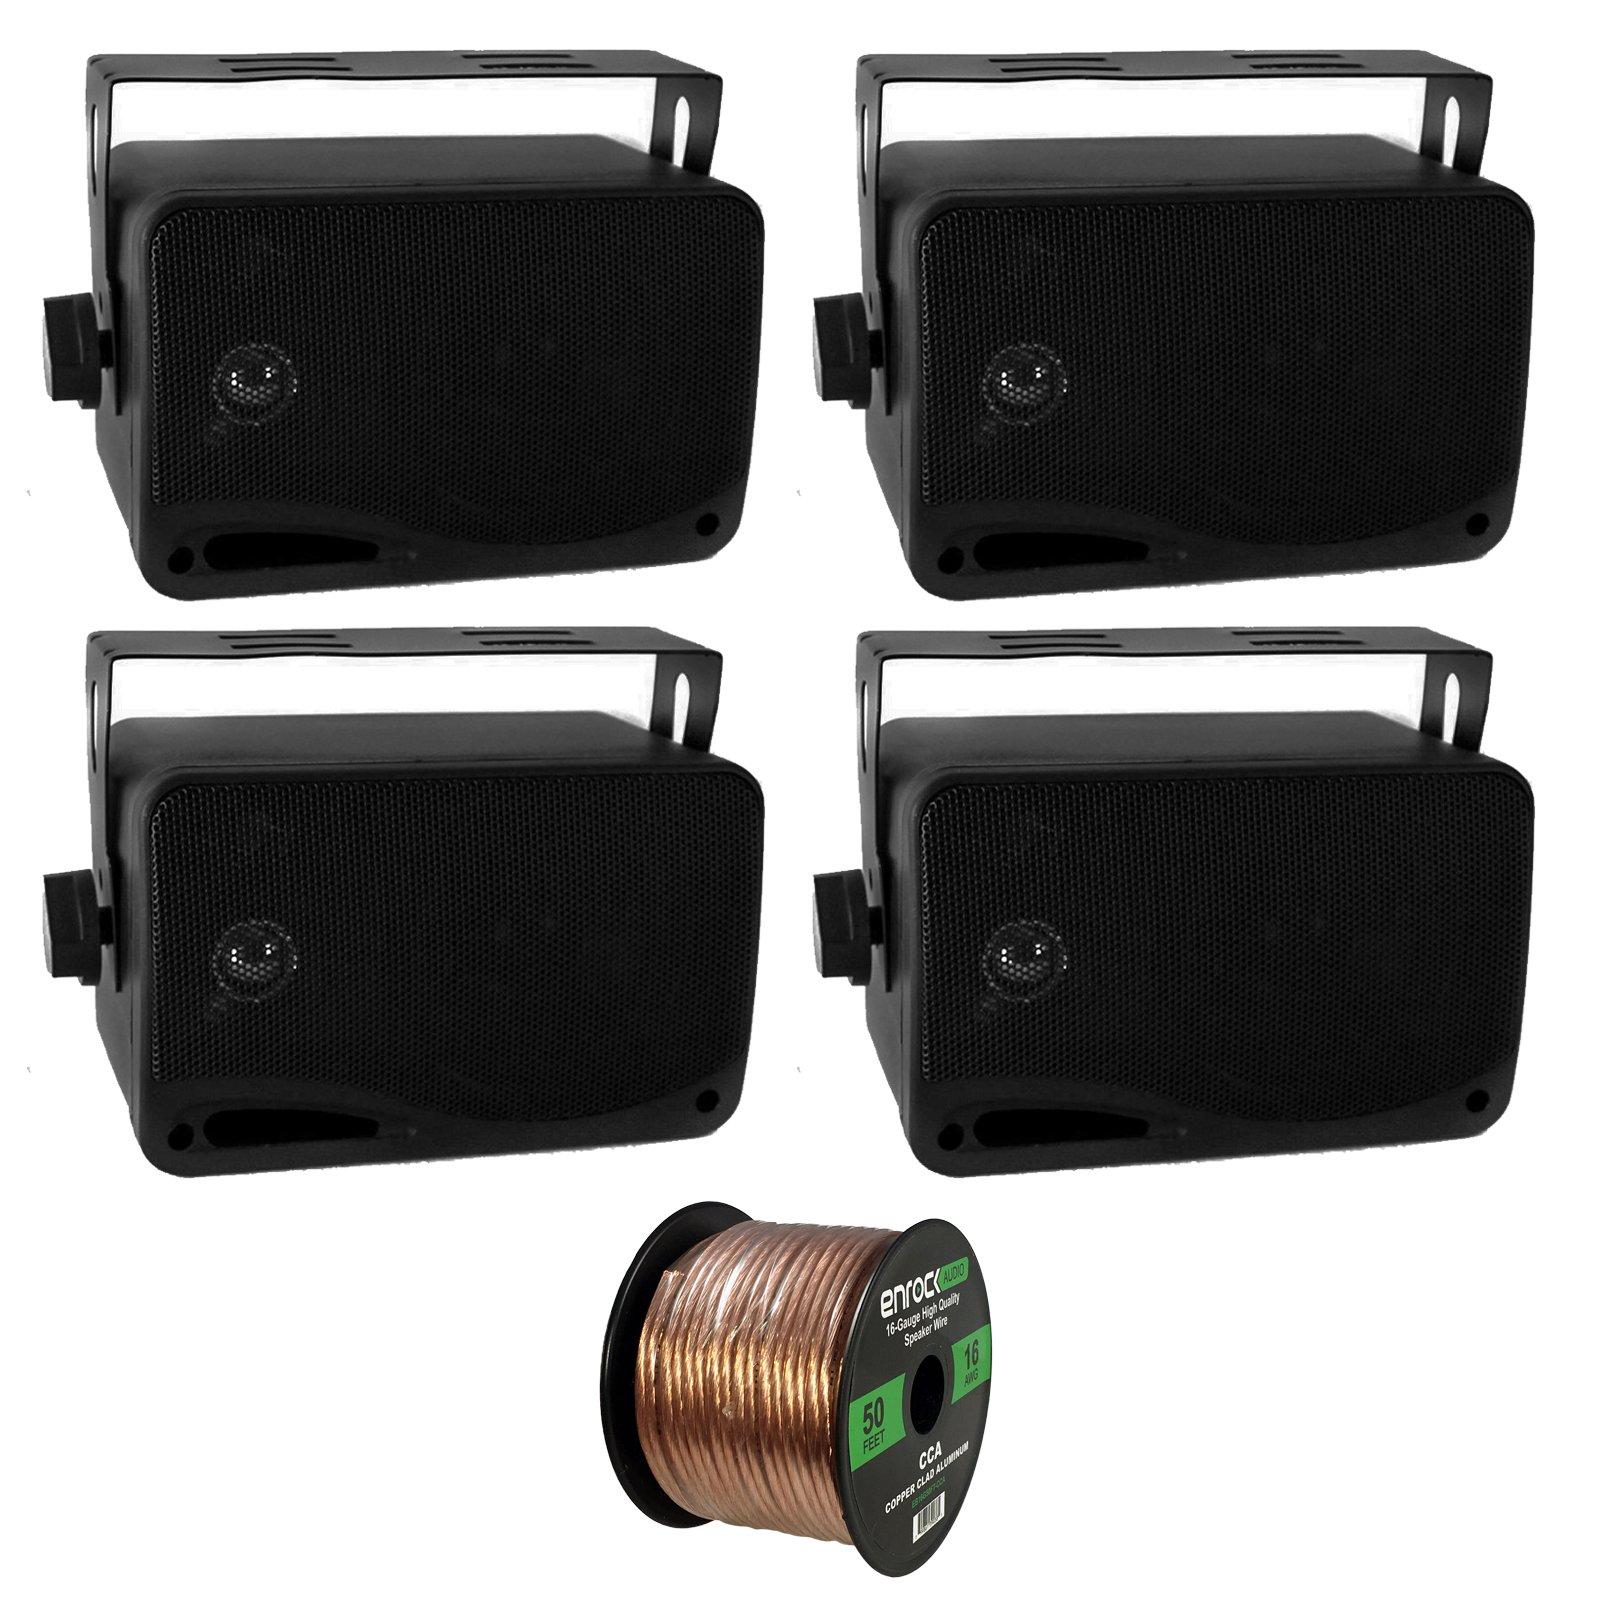 4 x New Pyle PLMR24 3.5'' 200 Watt 3-Way Weather Proof Marine Mini Box Speaker System (Black), and Enrock Audio 16-Gauge 50 Foot Speaker Wire